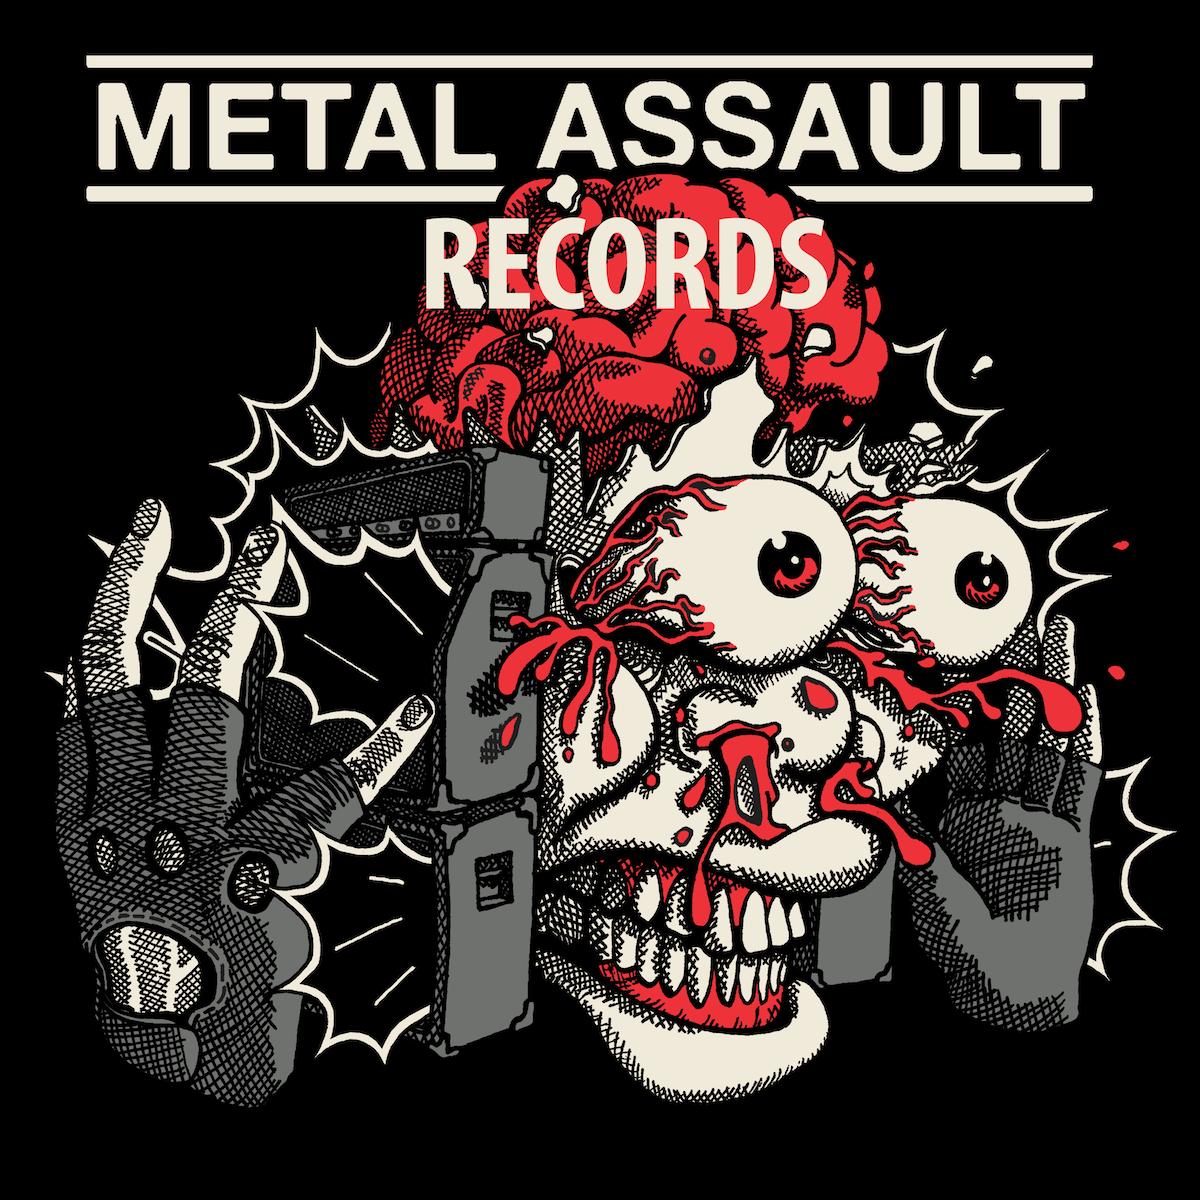 Metal Assault launches Record Label, announces Instrumental Doom